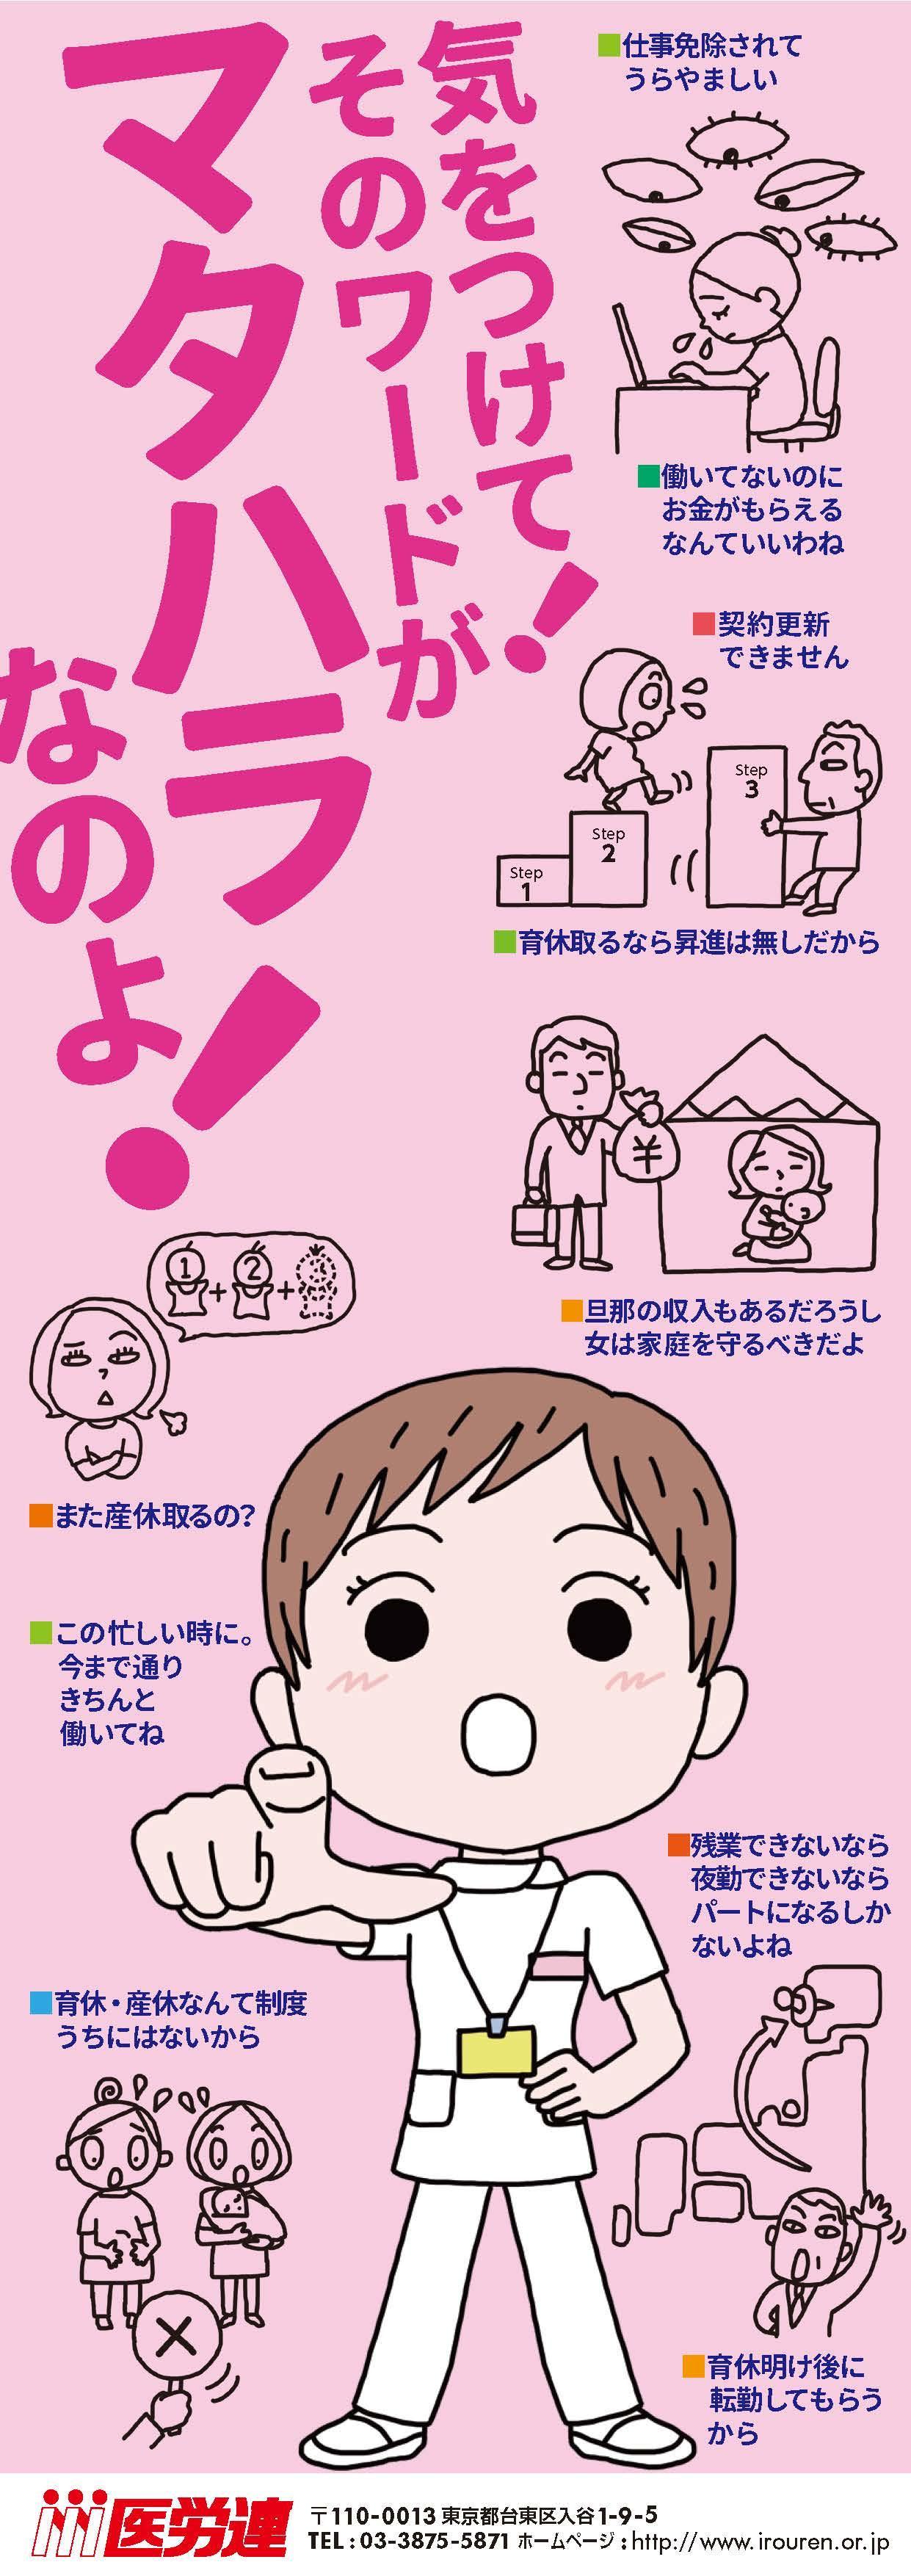 http://irouren.or.jp/news/389b5e3eaef21300b5f0e3a1a83f6cfaf45576c6.jpg